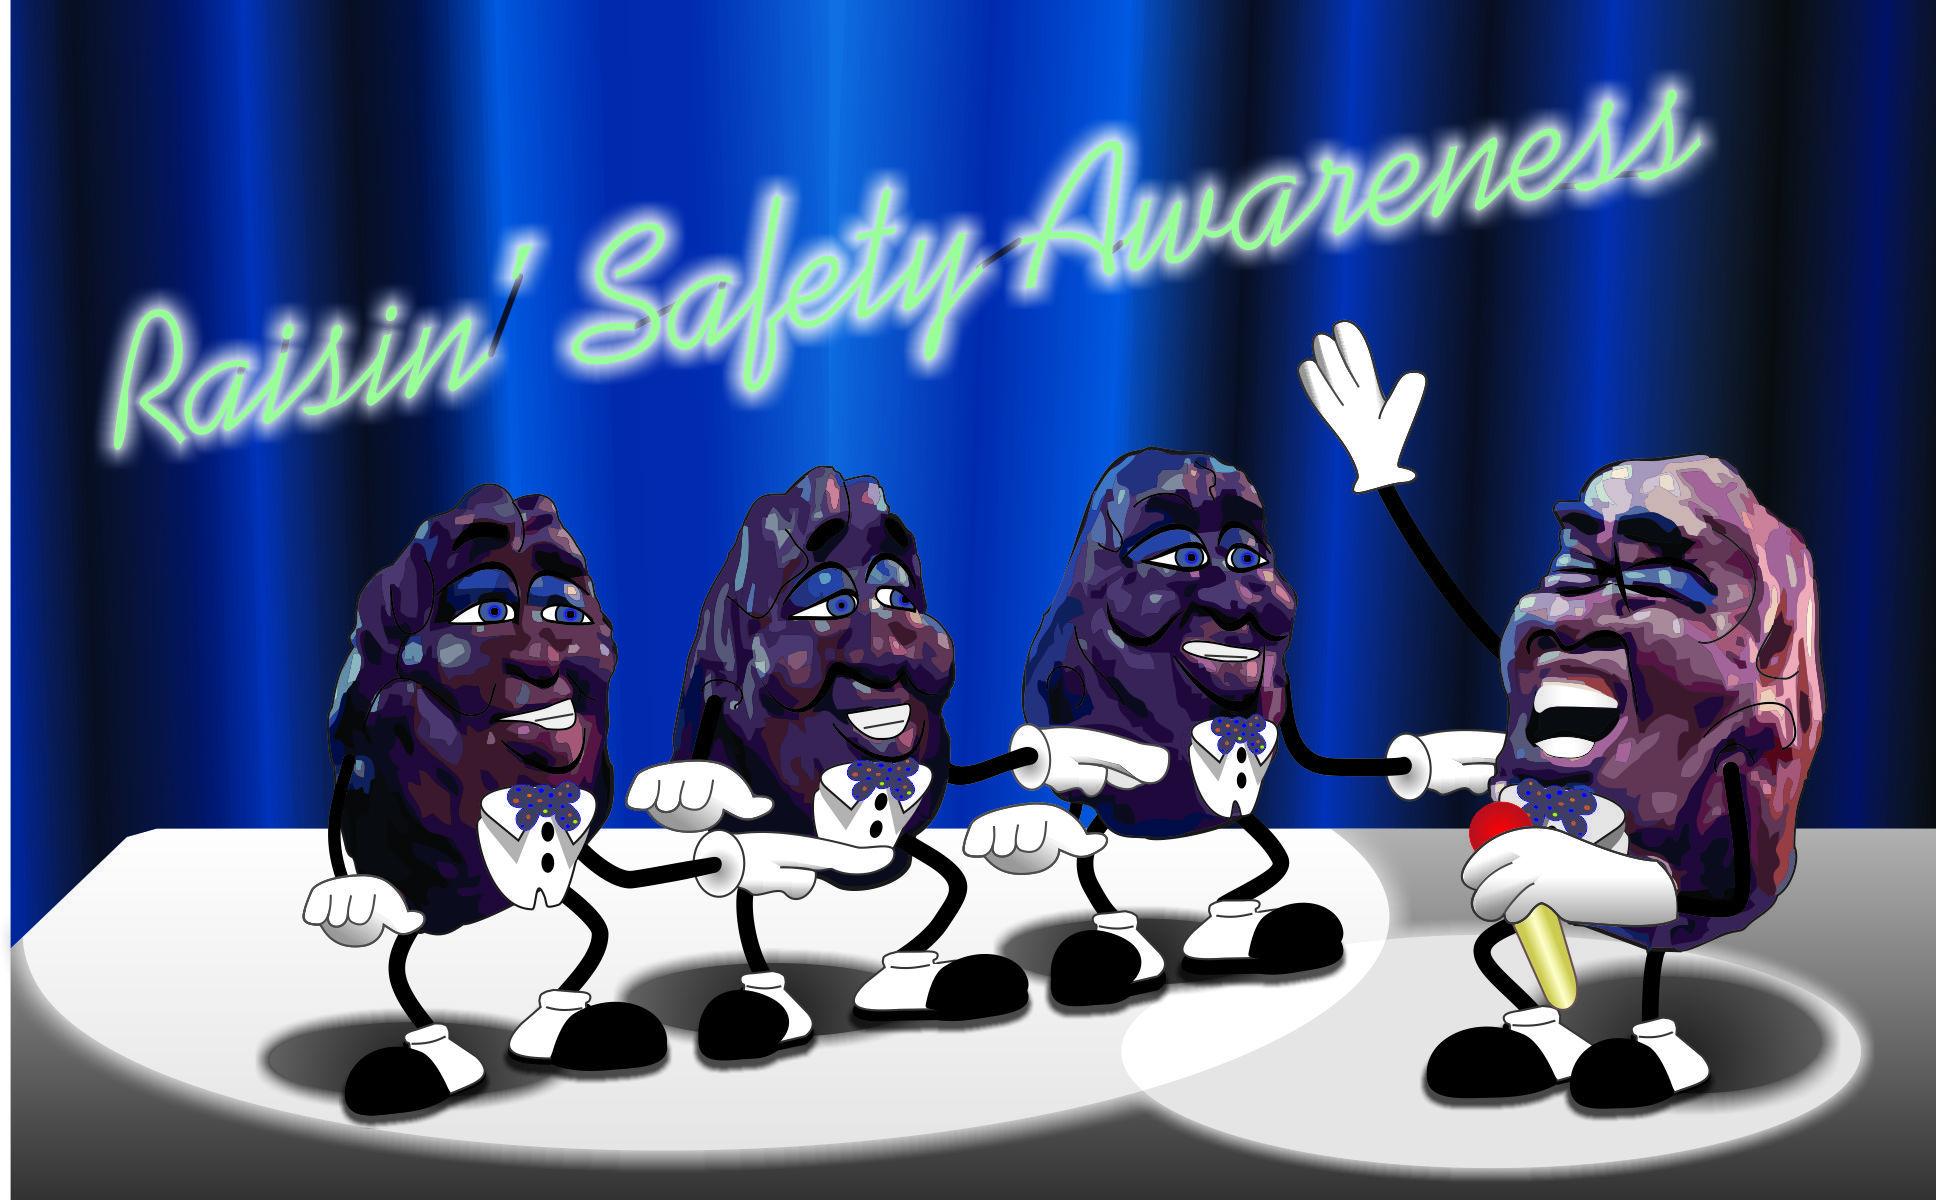 California Raisins - Raisin' Safety Awareness banner